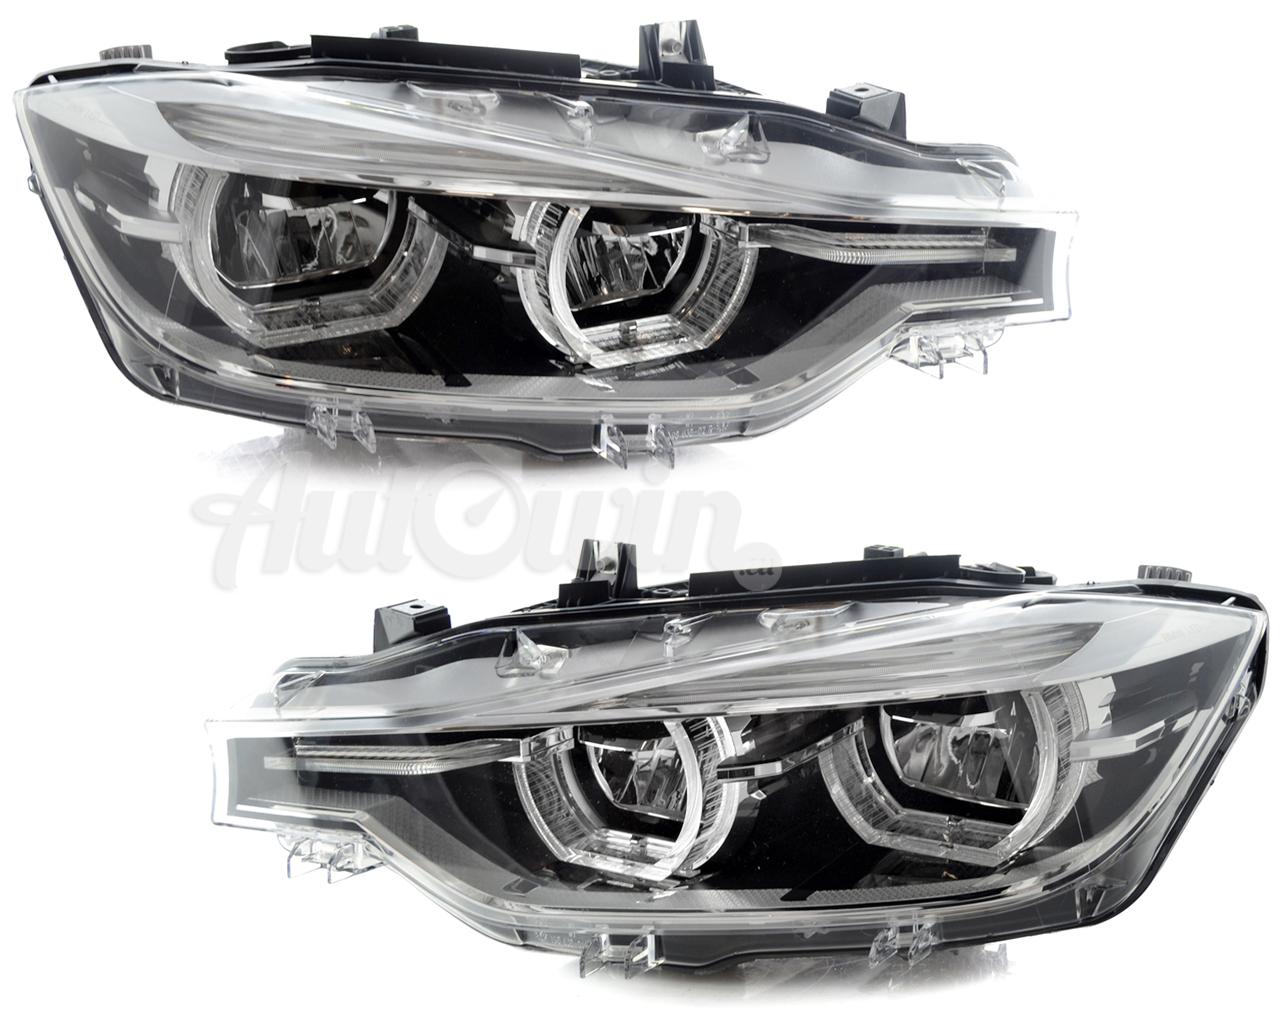 headlight pinterest pin detail headlights series bmw cars and